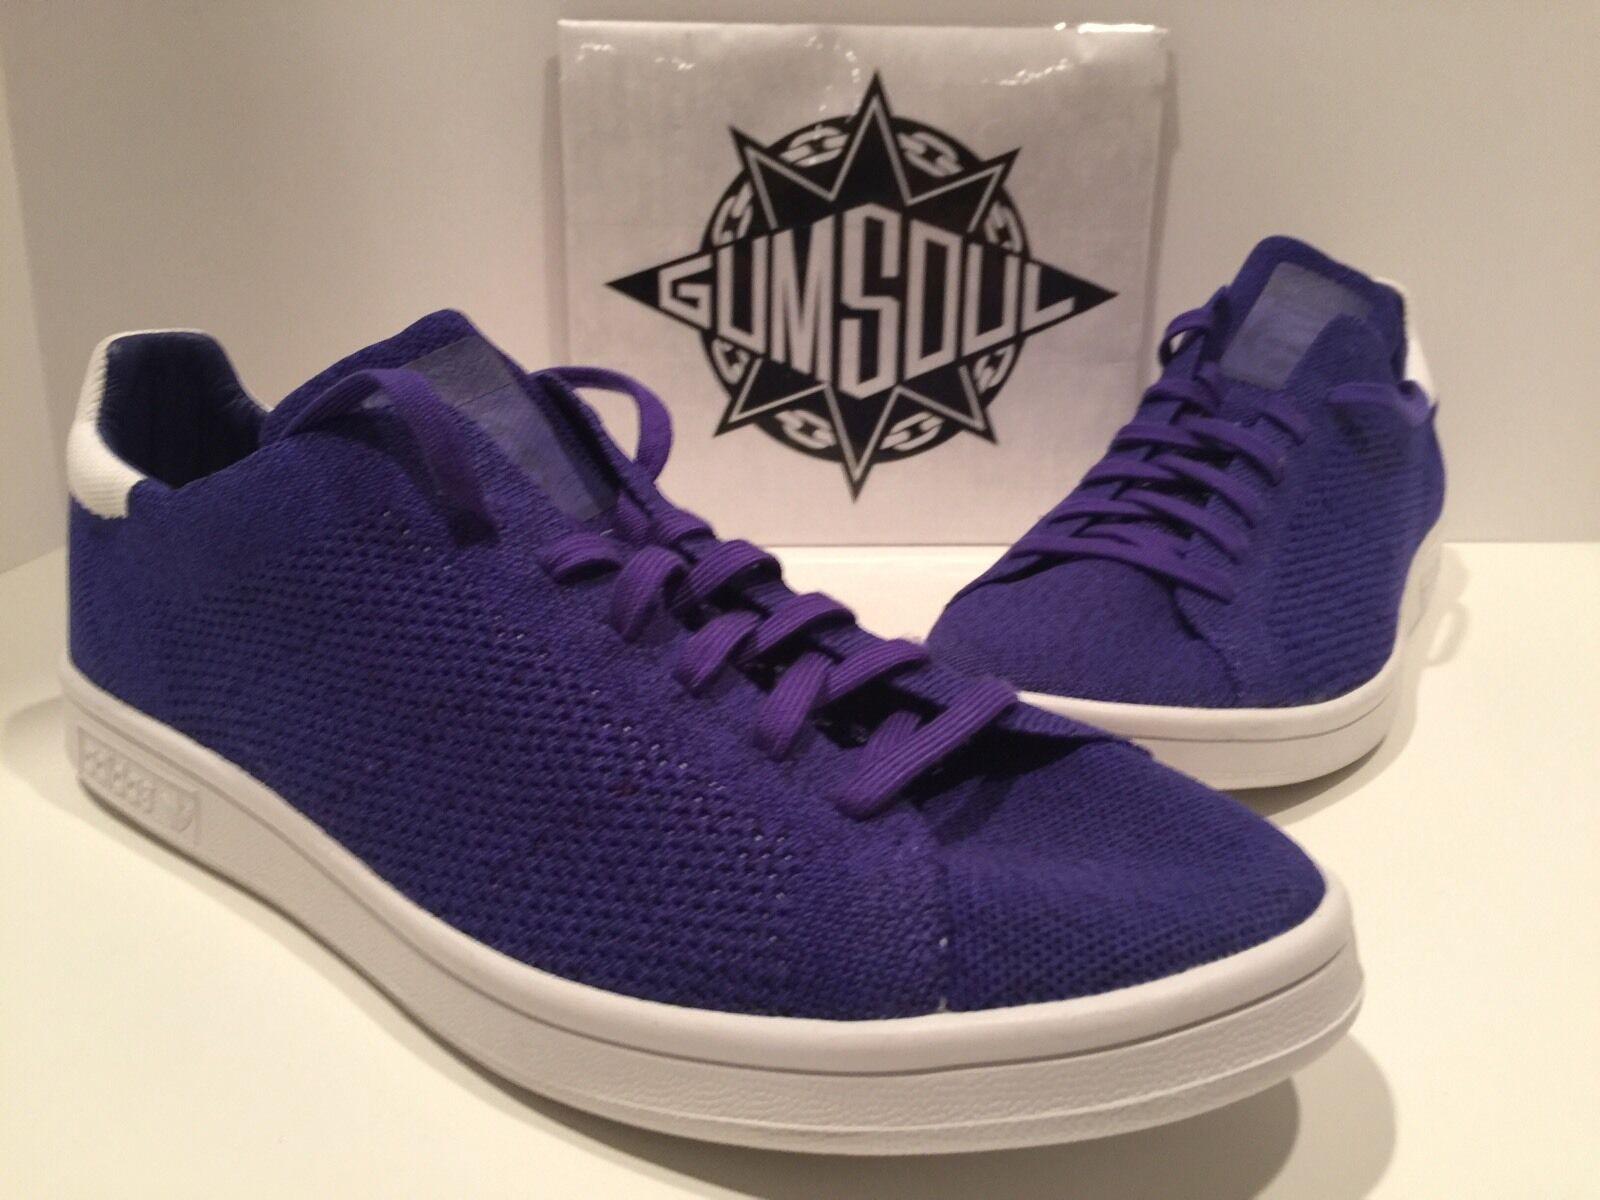 free shipping 83849 4014b ADIDAS ORIGINALS SMITH PRIMEKNIT NIGHT PURPLE B27151 sz 5.5 STAN FLASH  nxulwn8286-Athletic Shoes